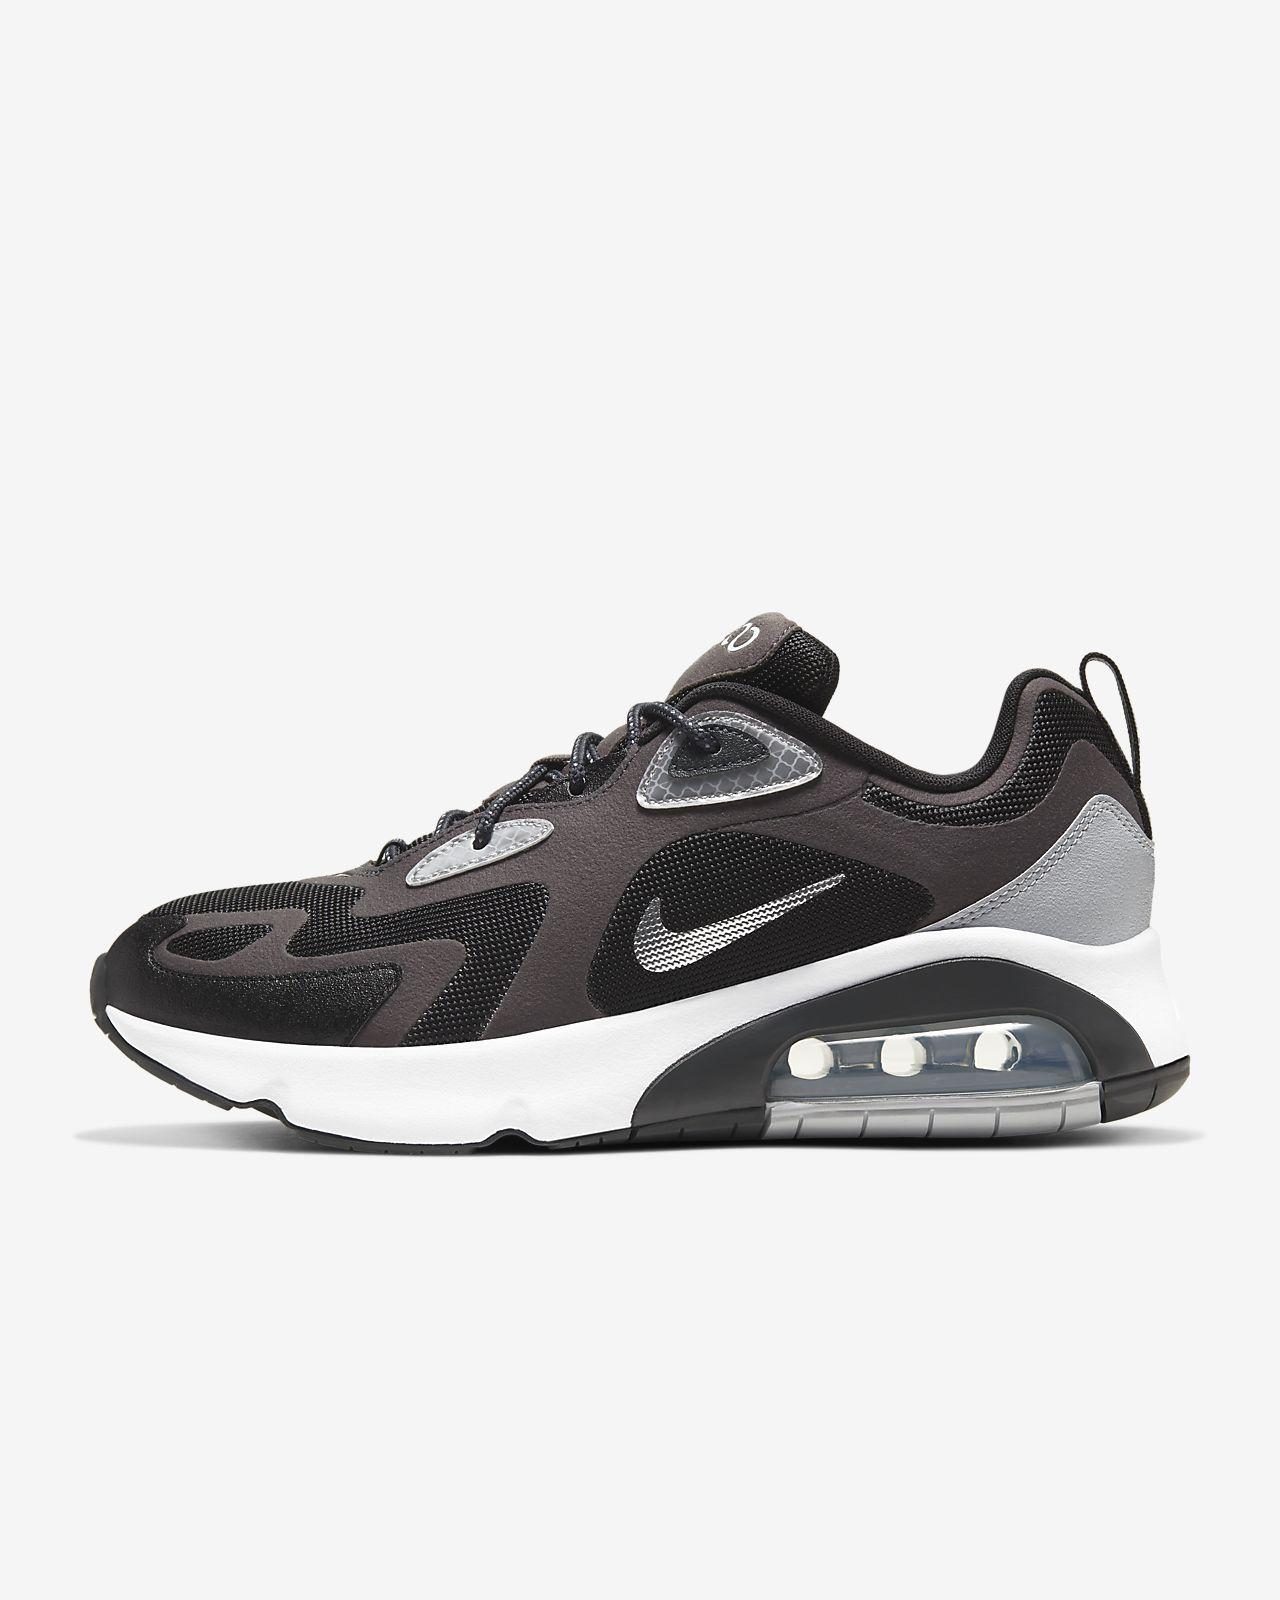 Nike Air Max Black : Køb Nike sko og sneakers til både herre